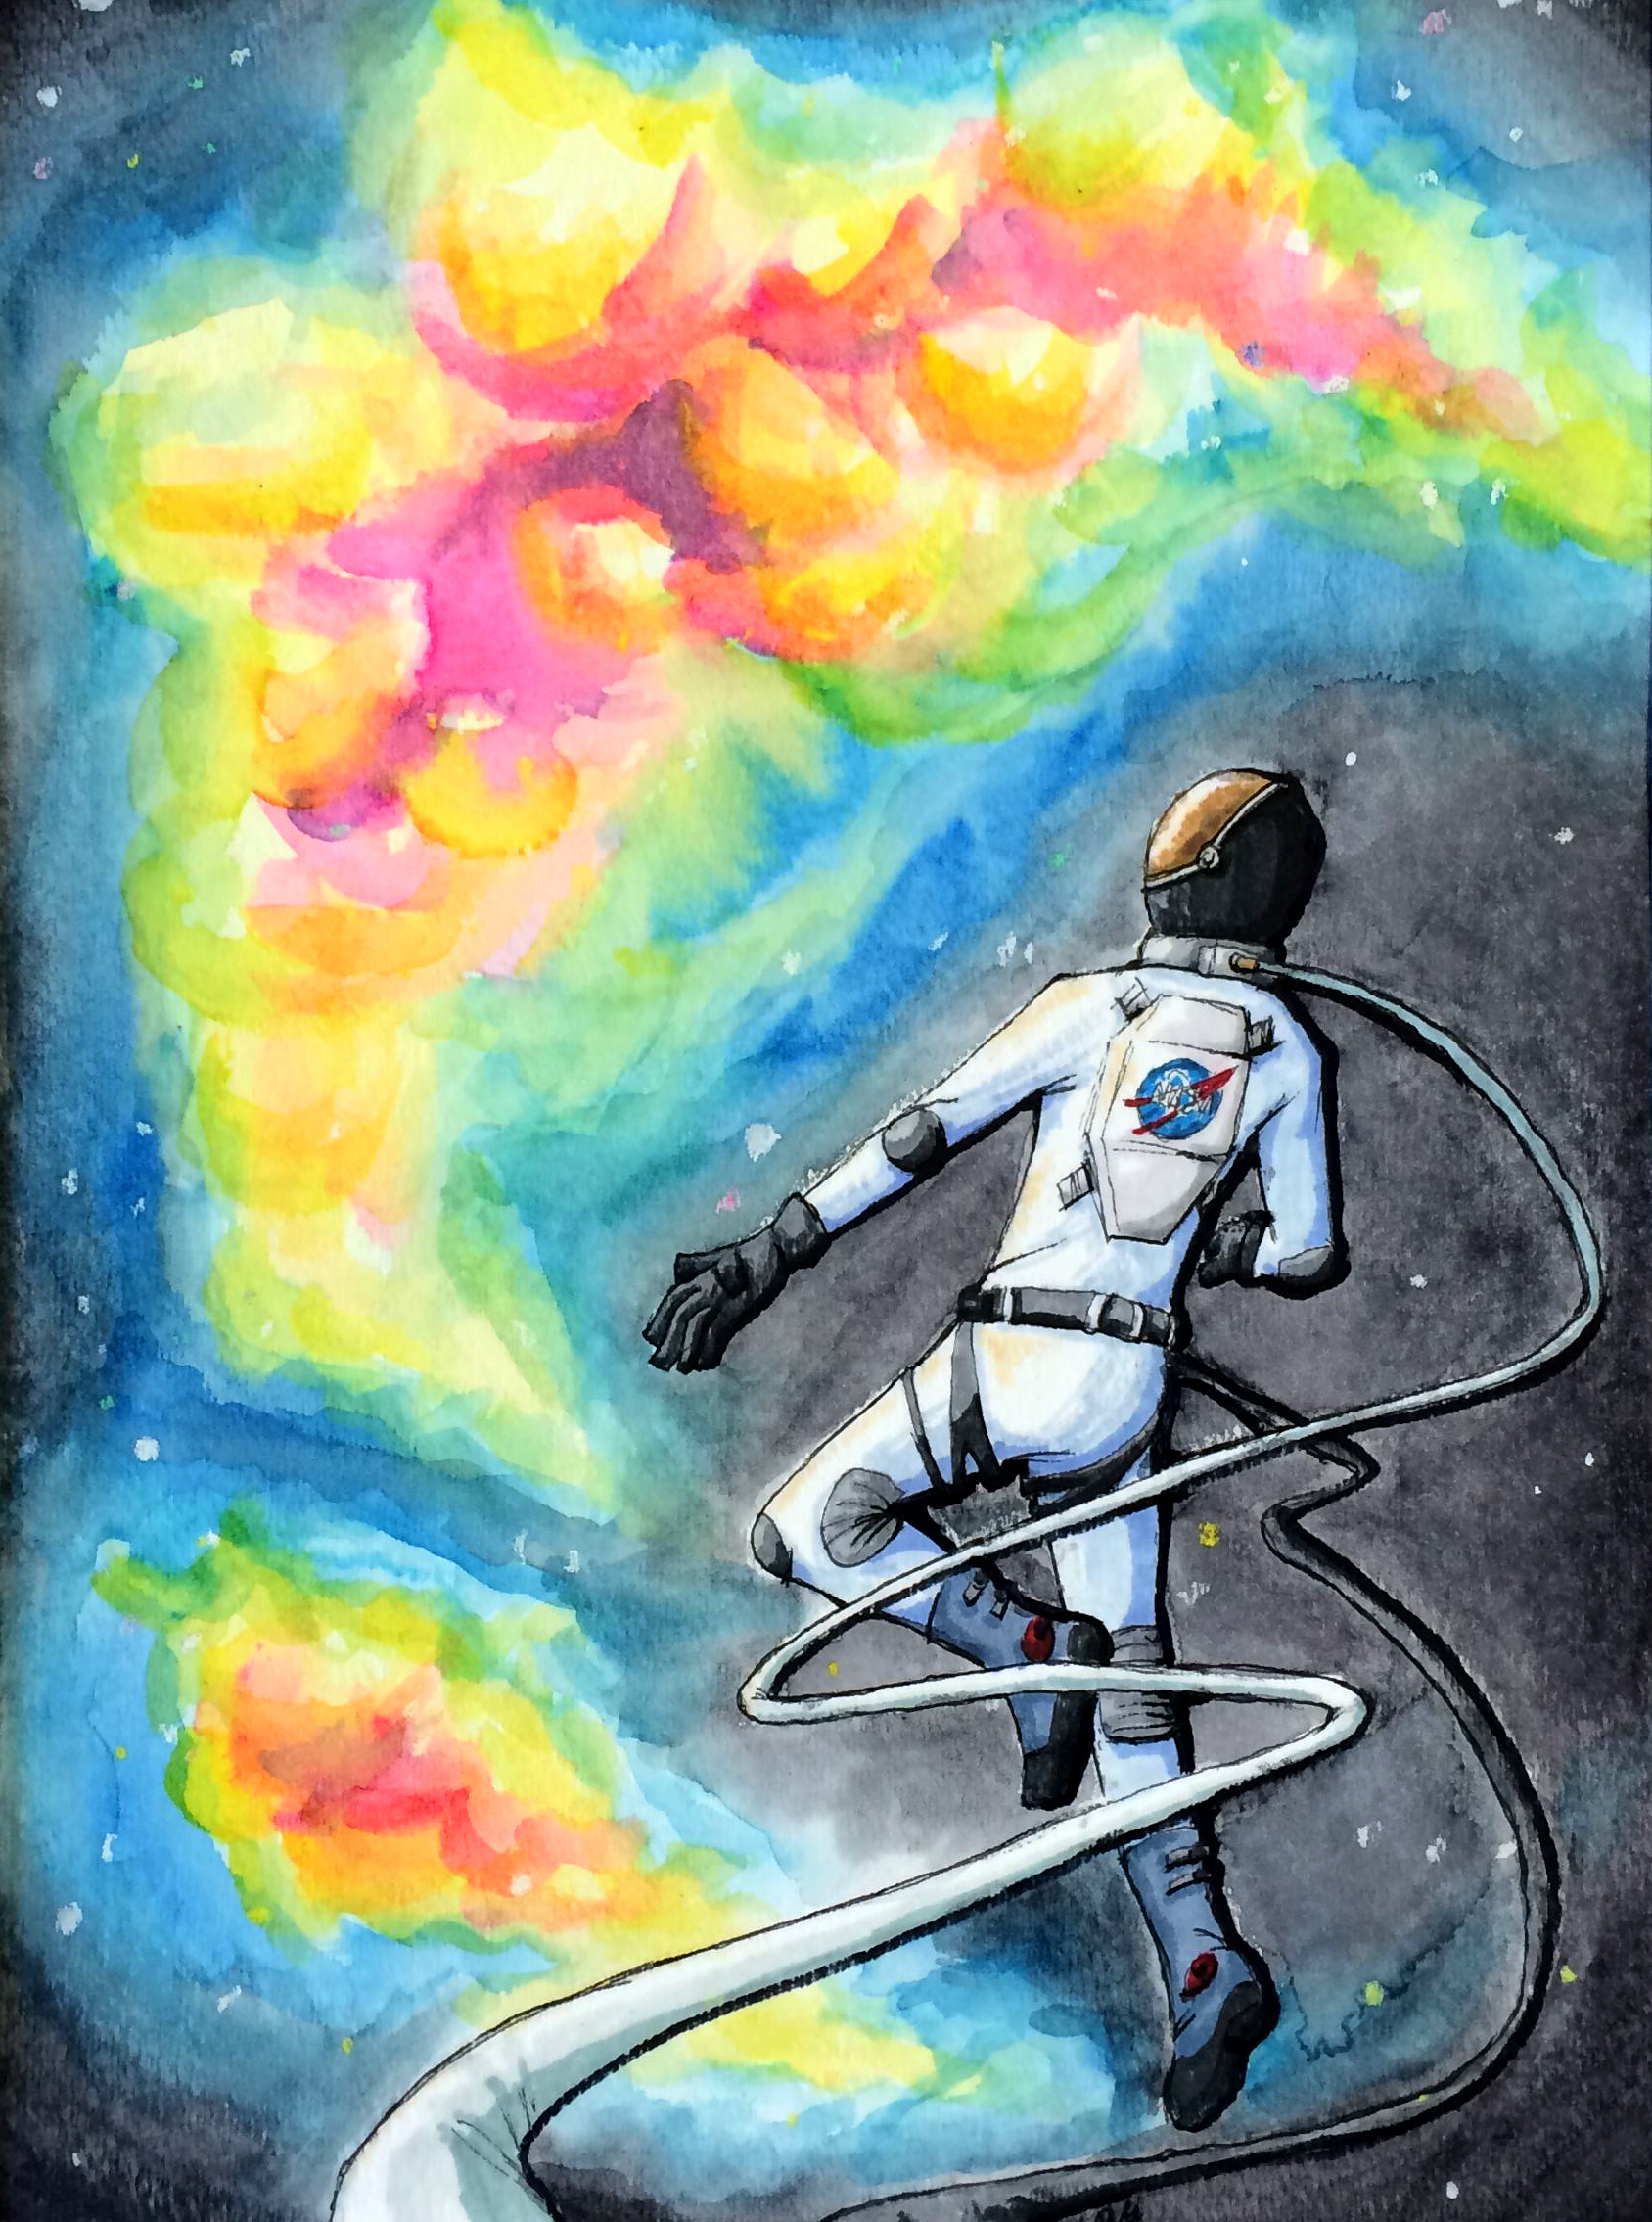 2015 NASA Langley Student Art Contest | NASA